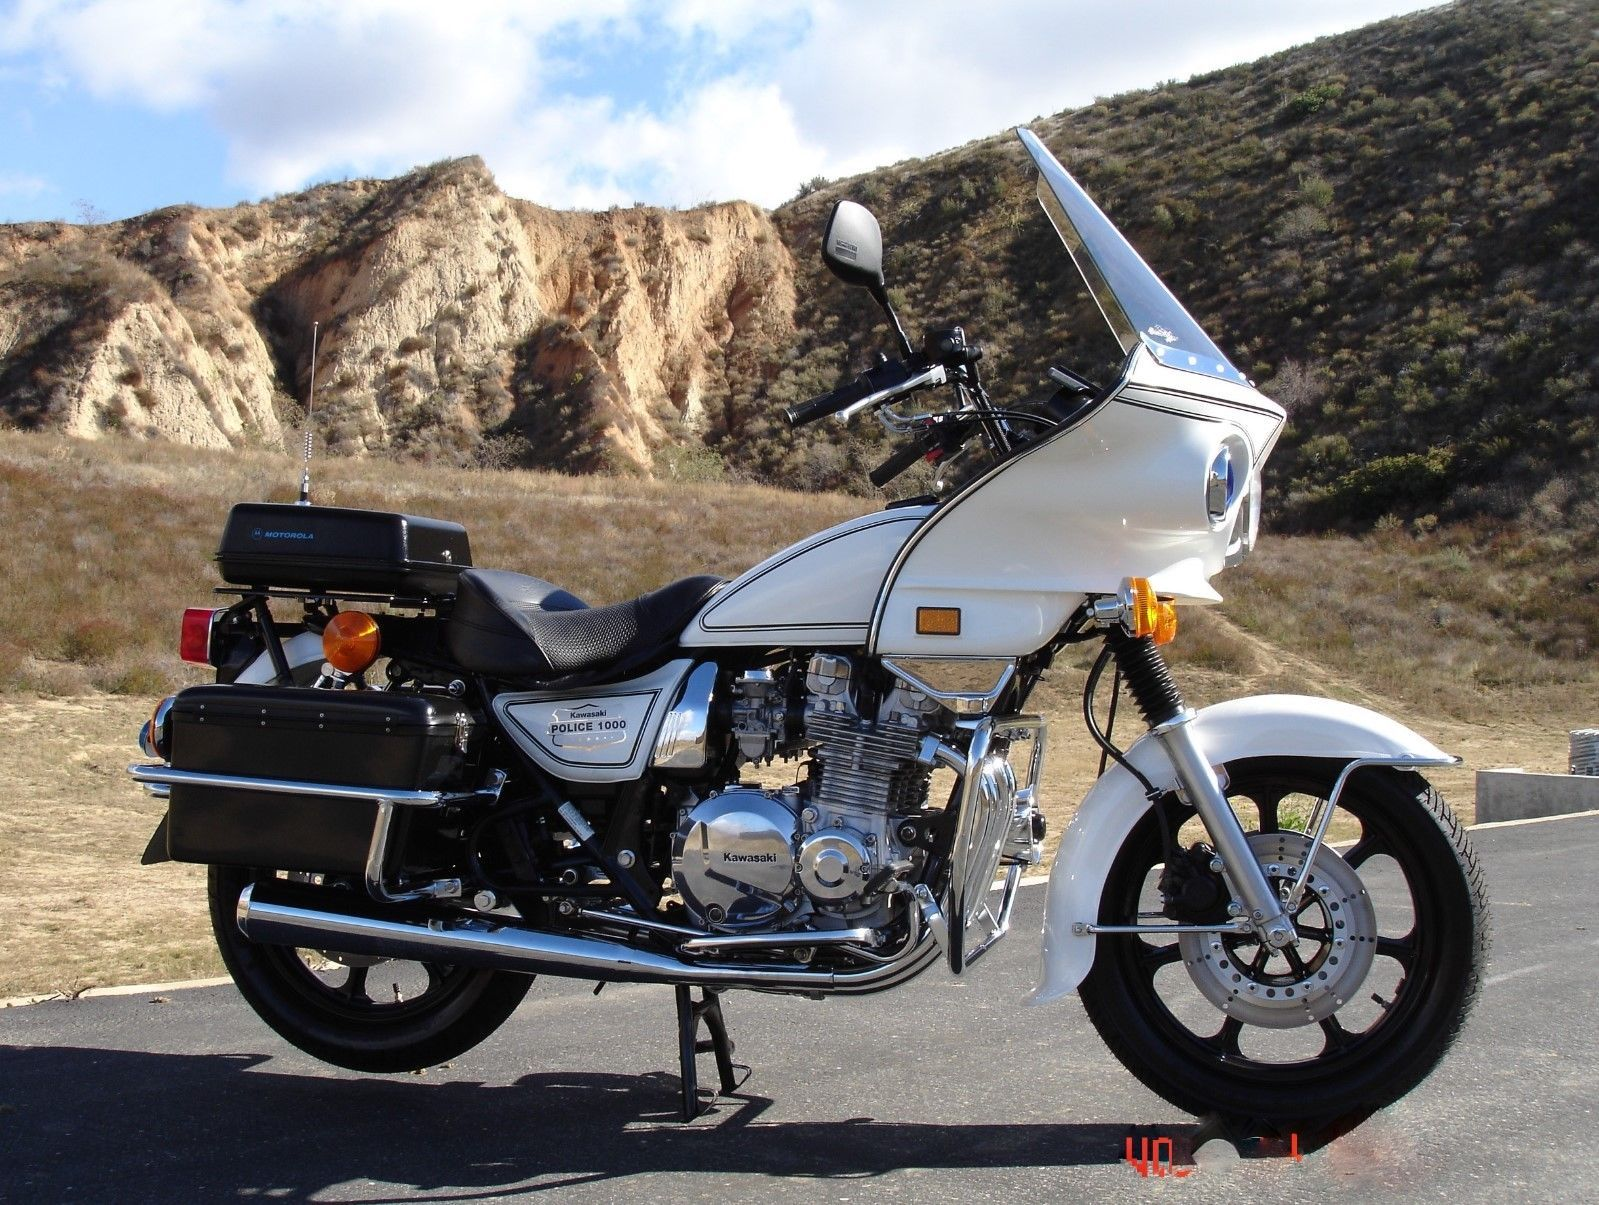 medium resolution of 2000 kawasaki kz 1000 kz1000p police show bike spare bike nos ebay link